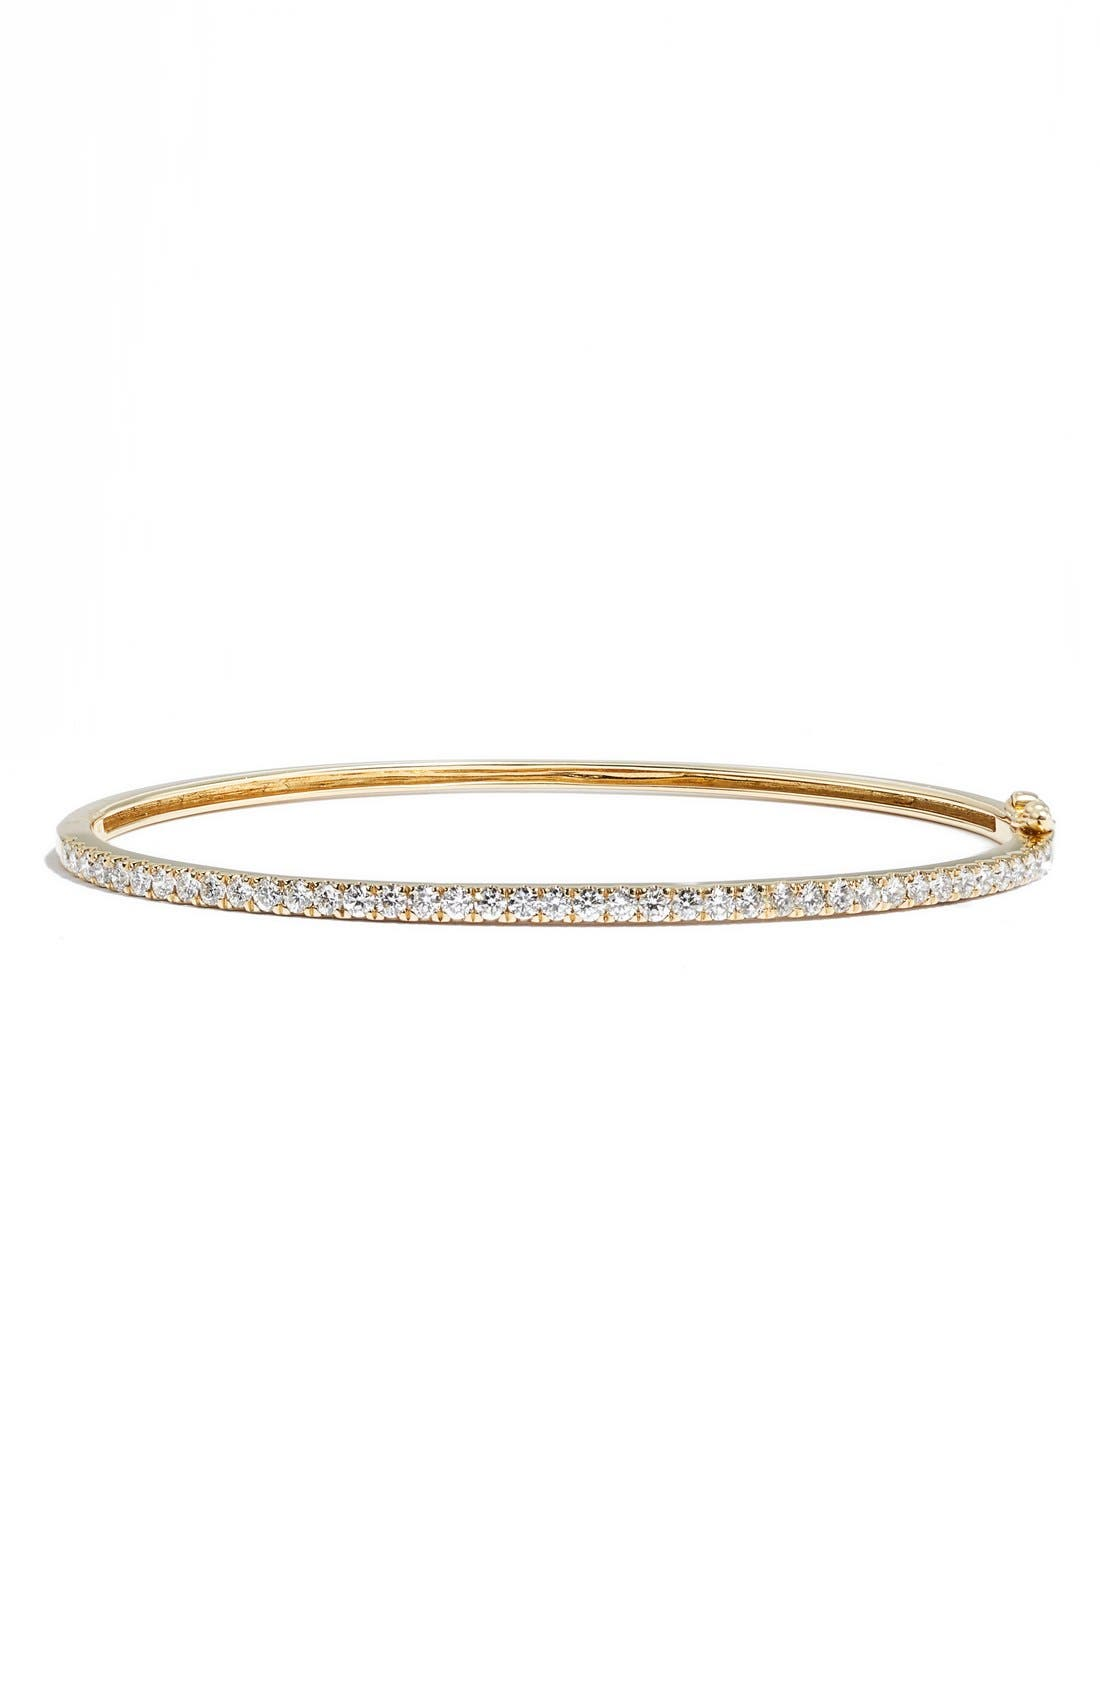 'Stackable' Large Skinny Diamond Bangle,                         Main,                         color, YELLOW GOLD